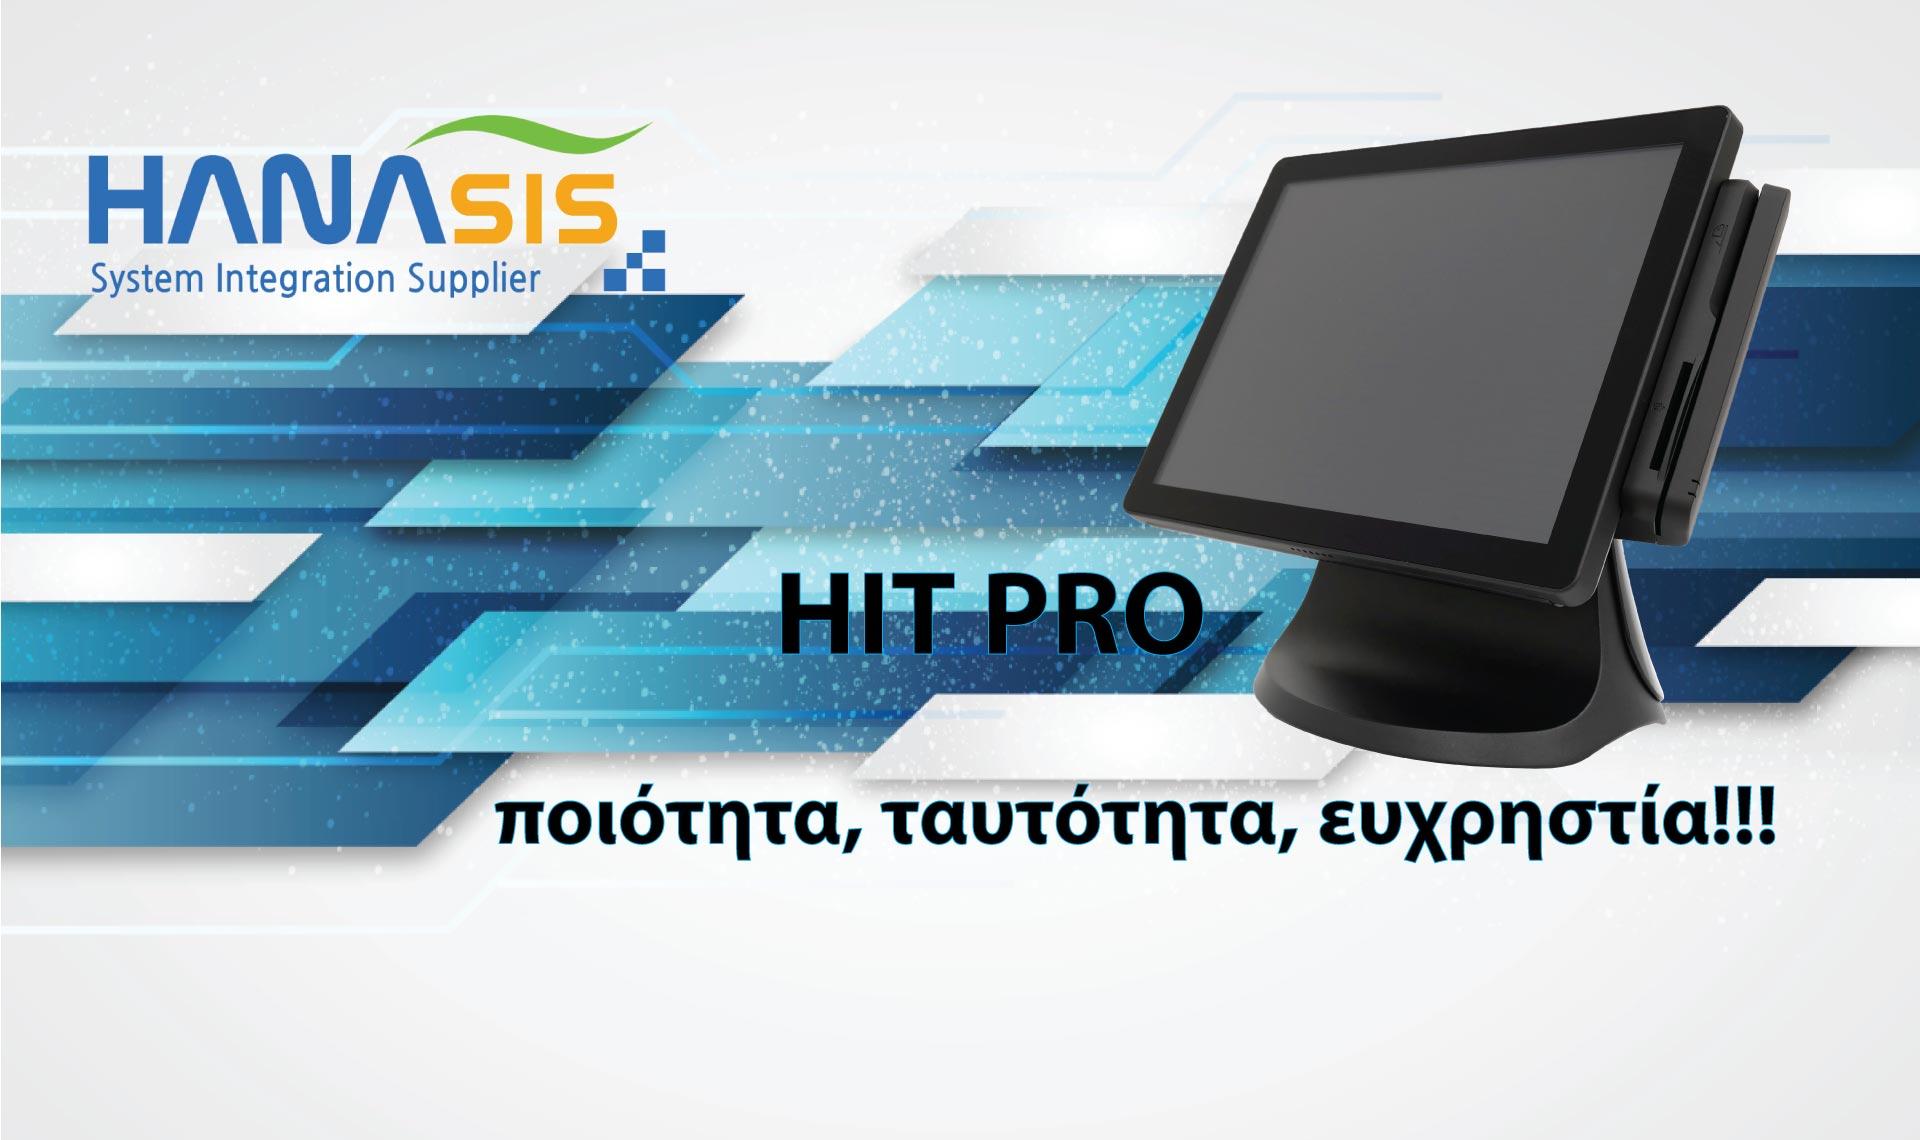 Hanasis pos systems